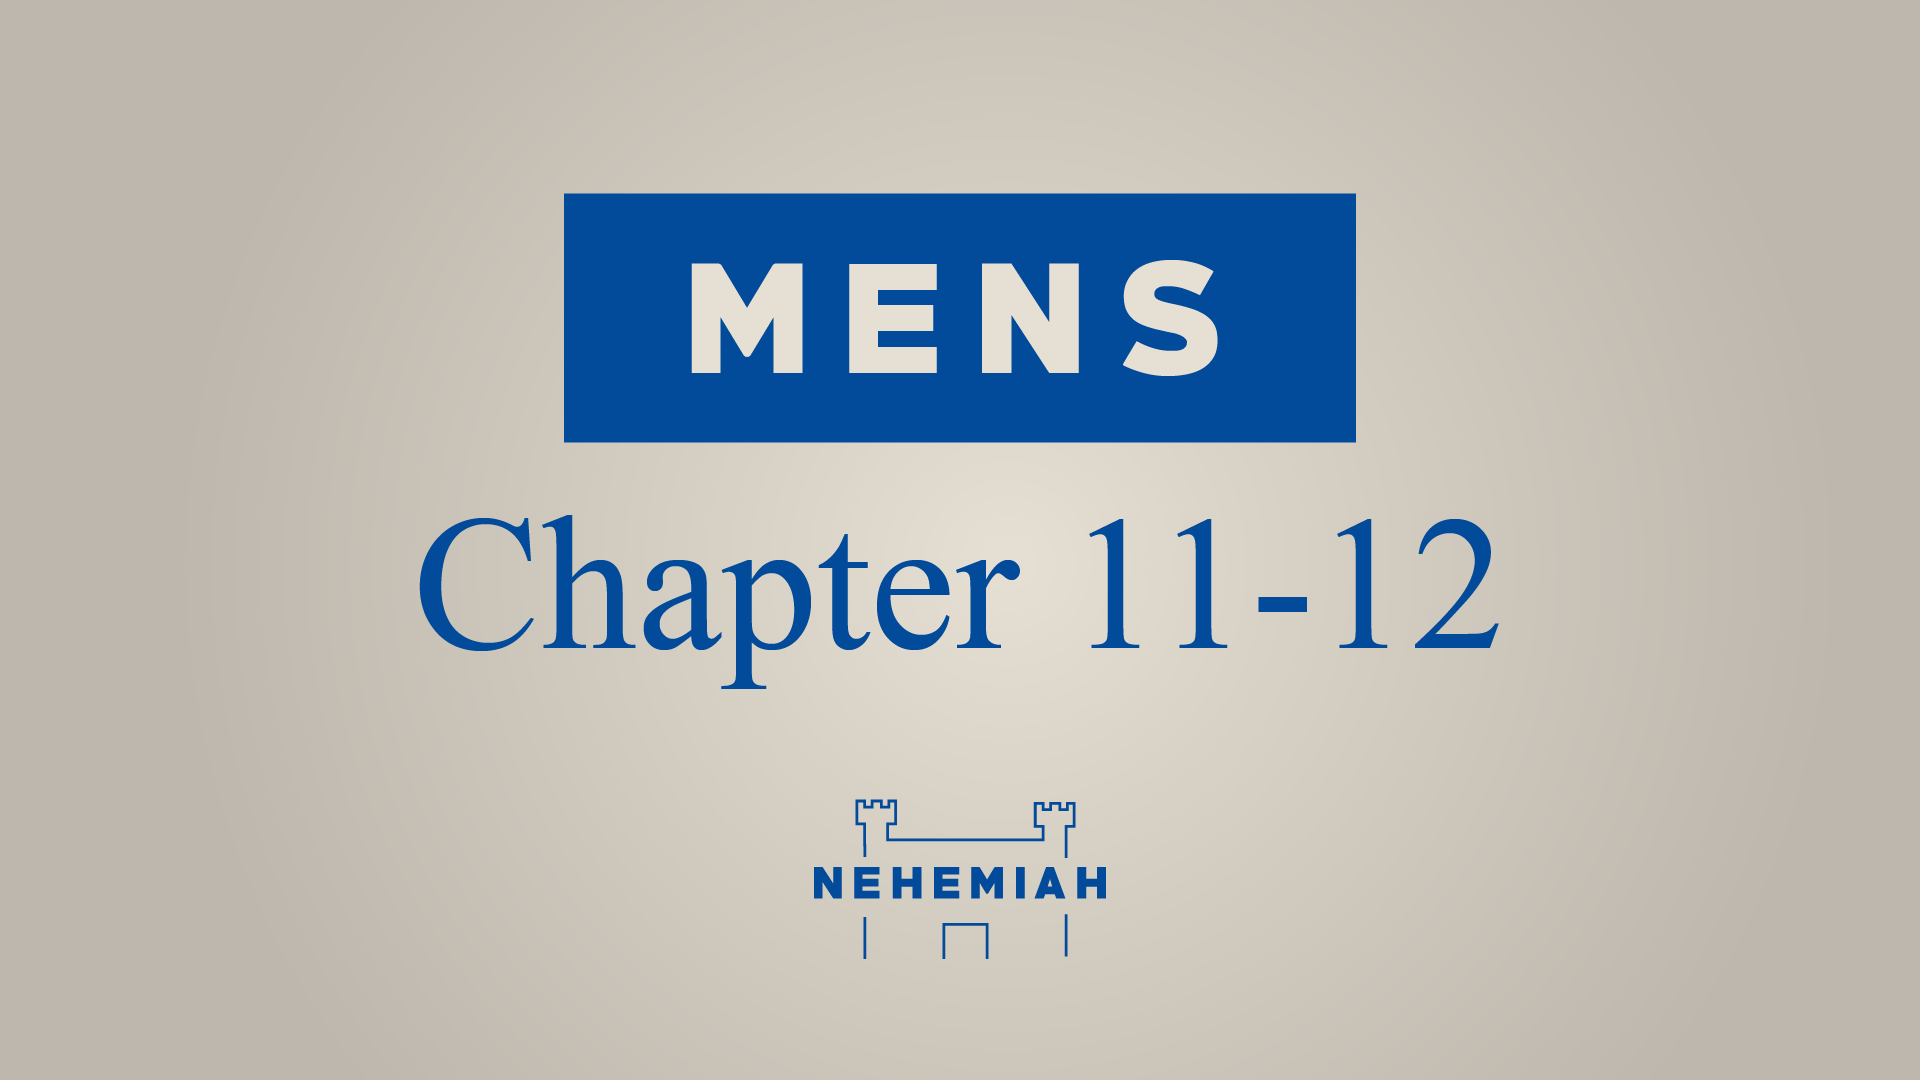 Nehemiah-BS_Men-11-12.png